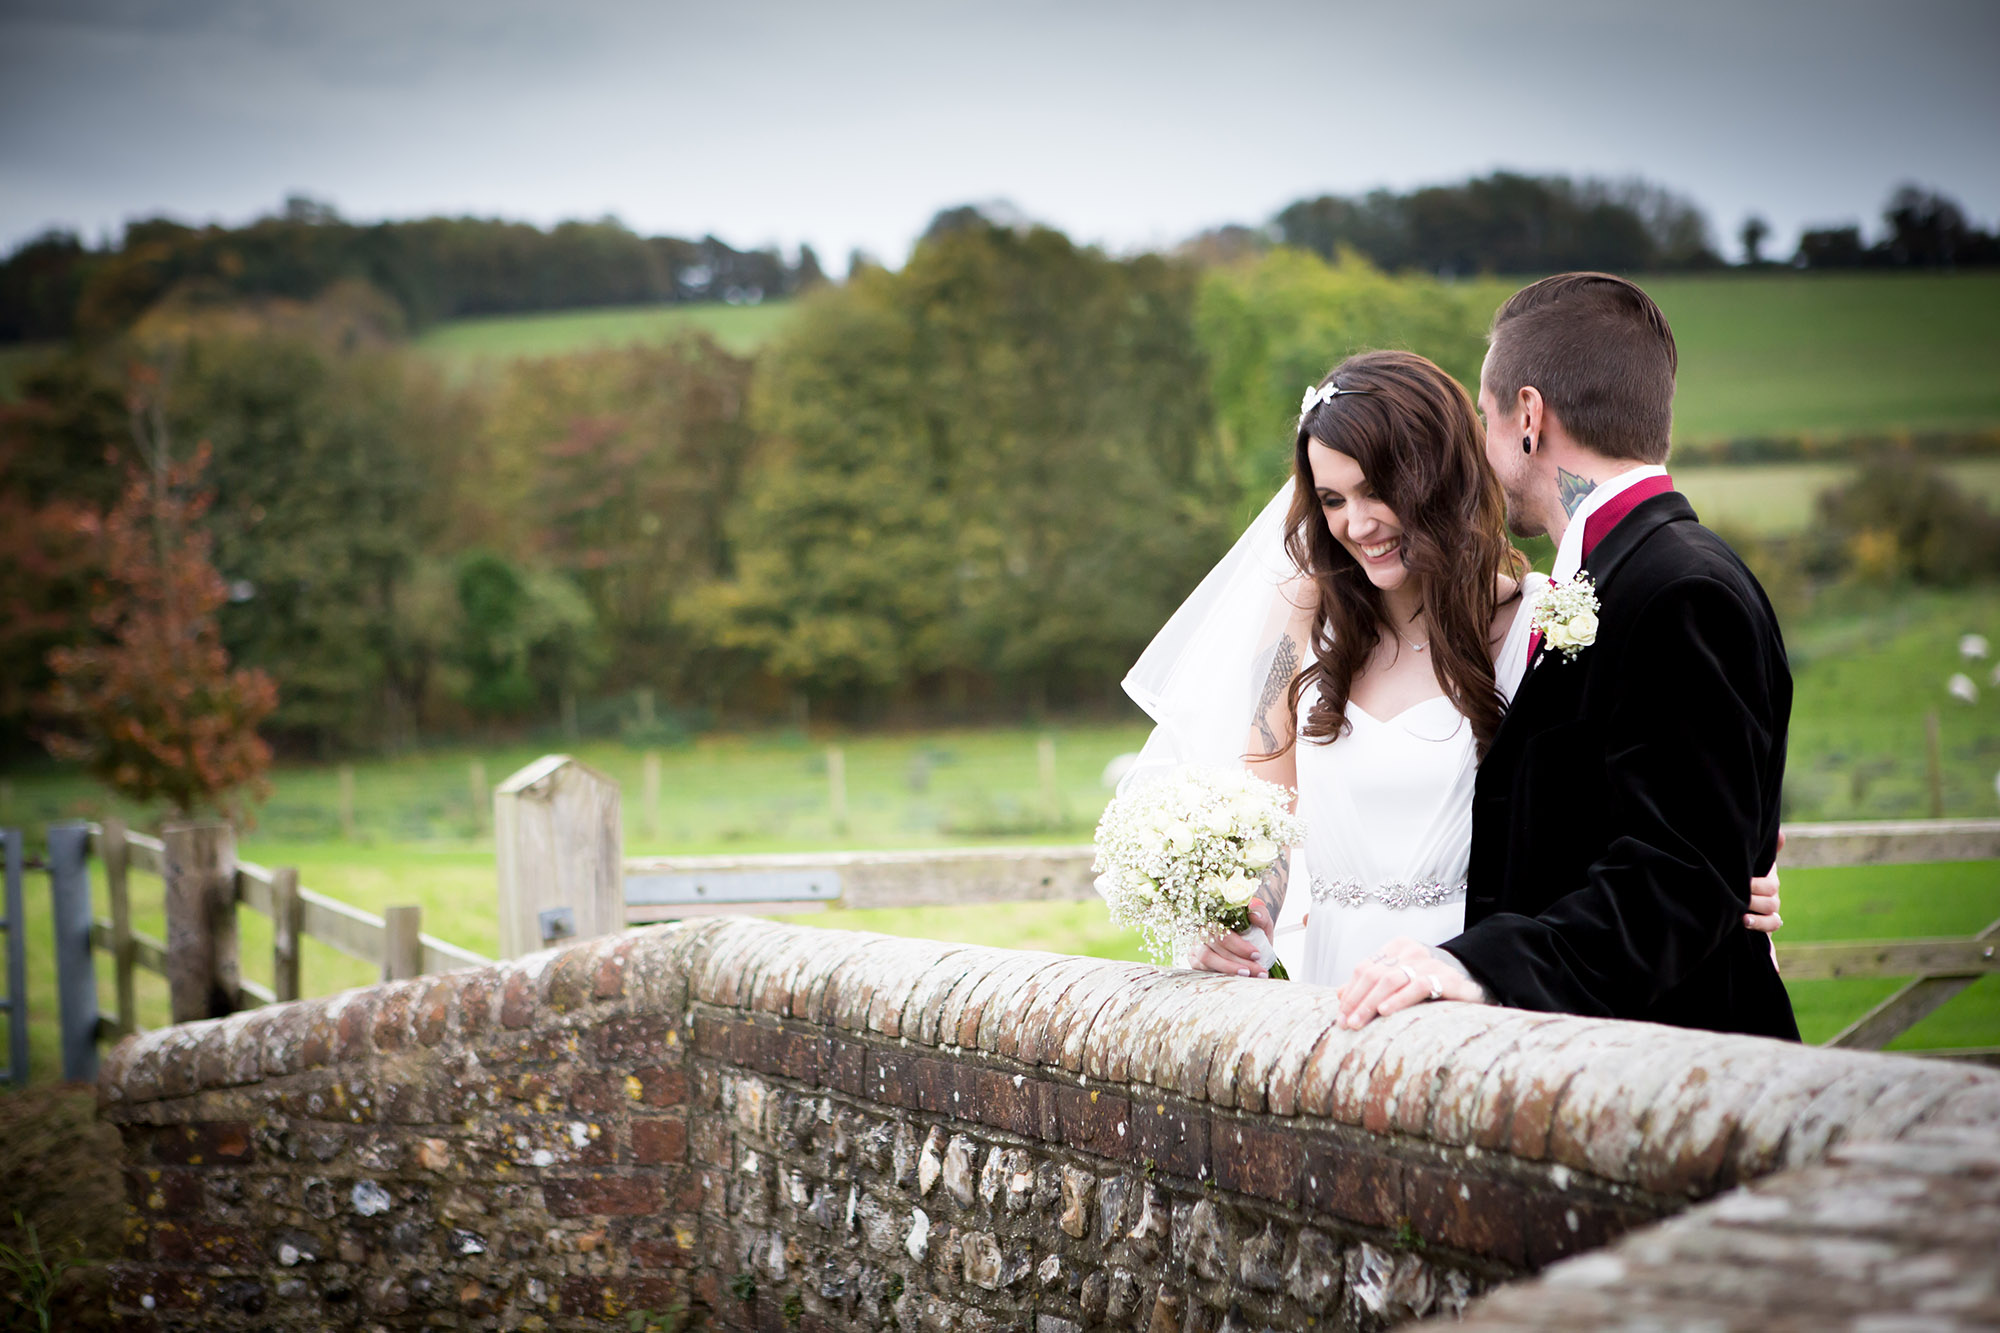 julia-toms-featured-weddings-west-sussex-004.jpg